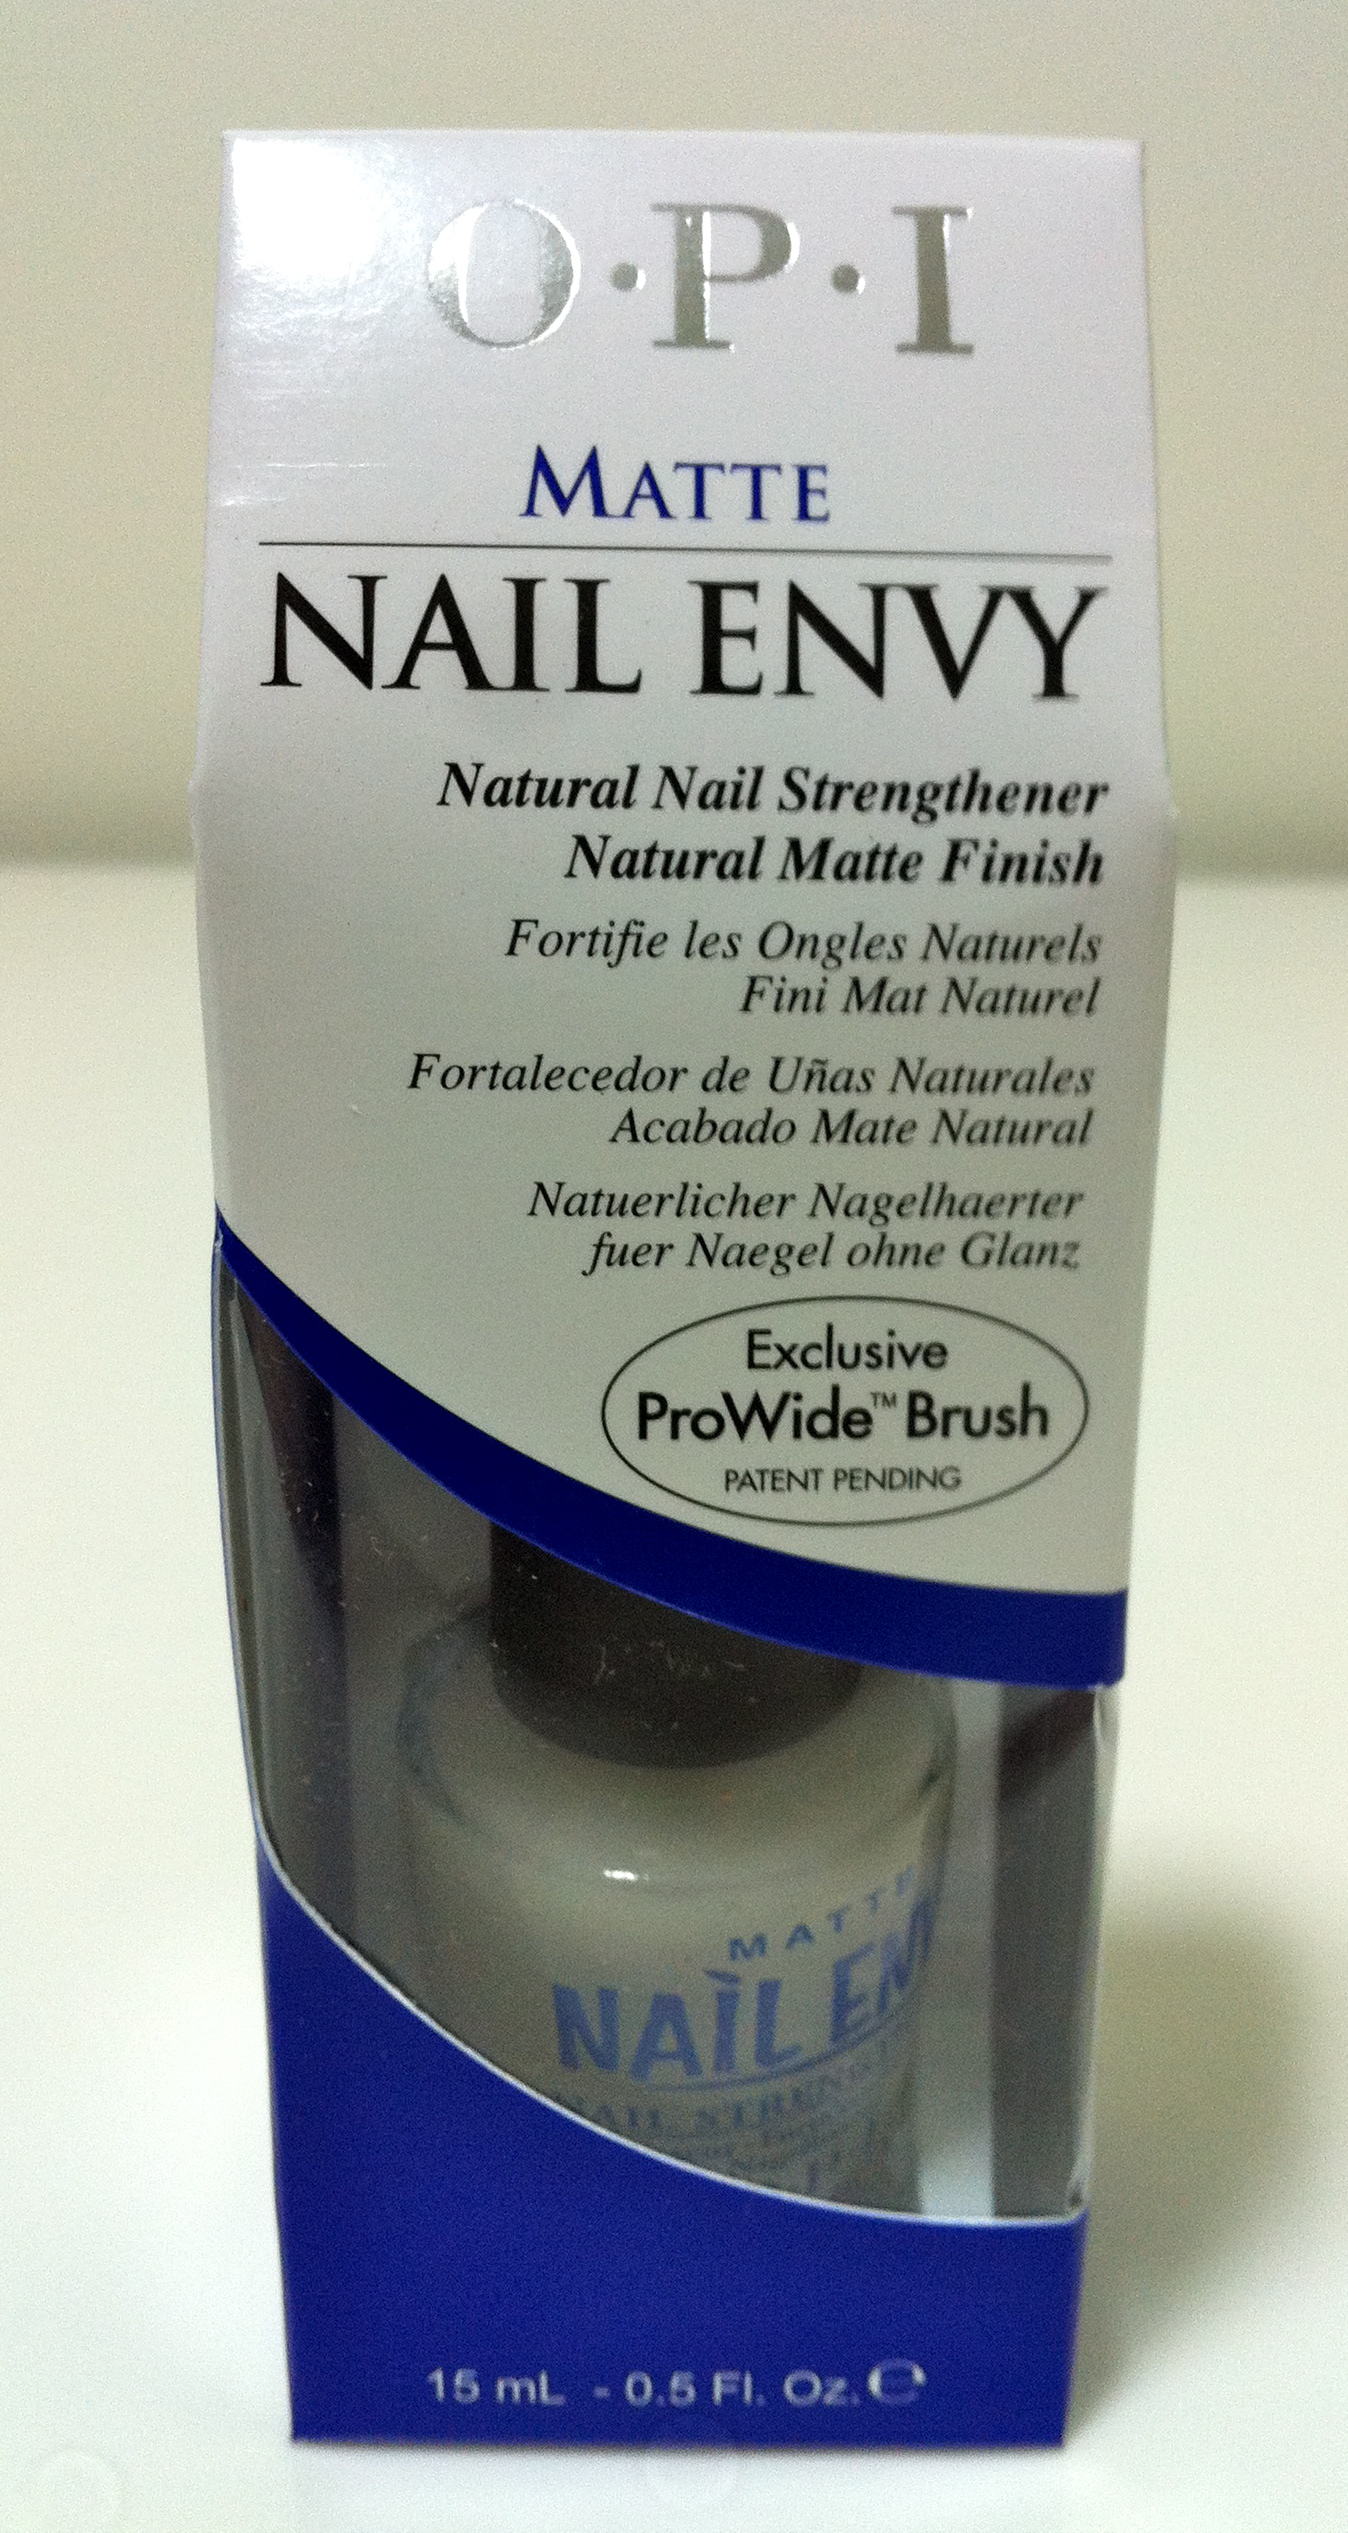 Opi Matte Nail Envy Instructions